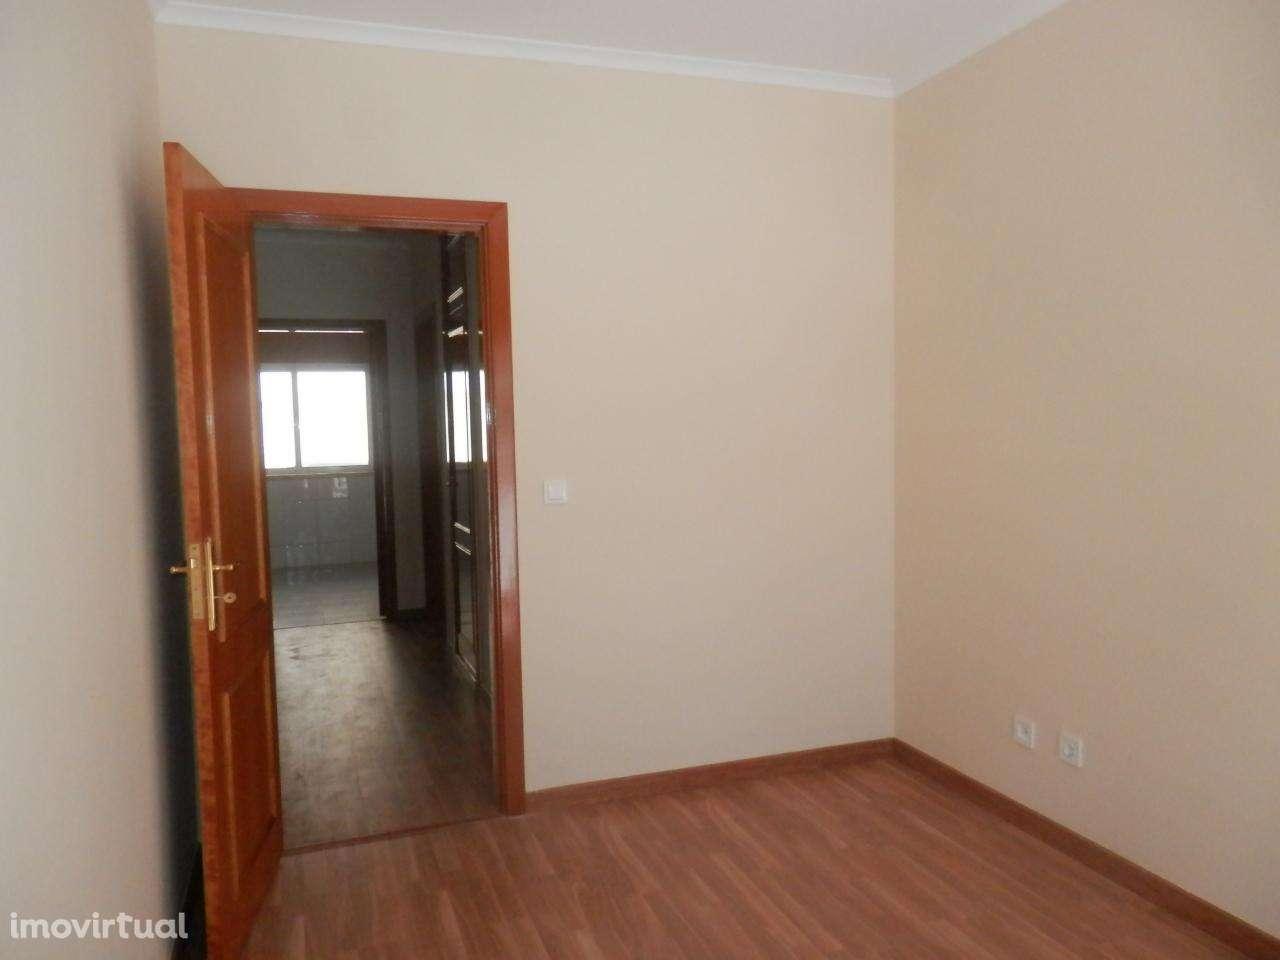 Apartamento para comprar, Rio de Mouro, Sintra, Lisboa - Foto 10